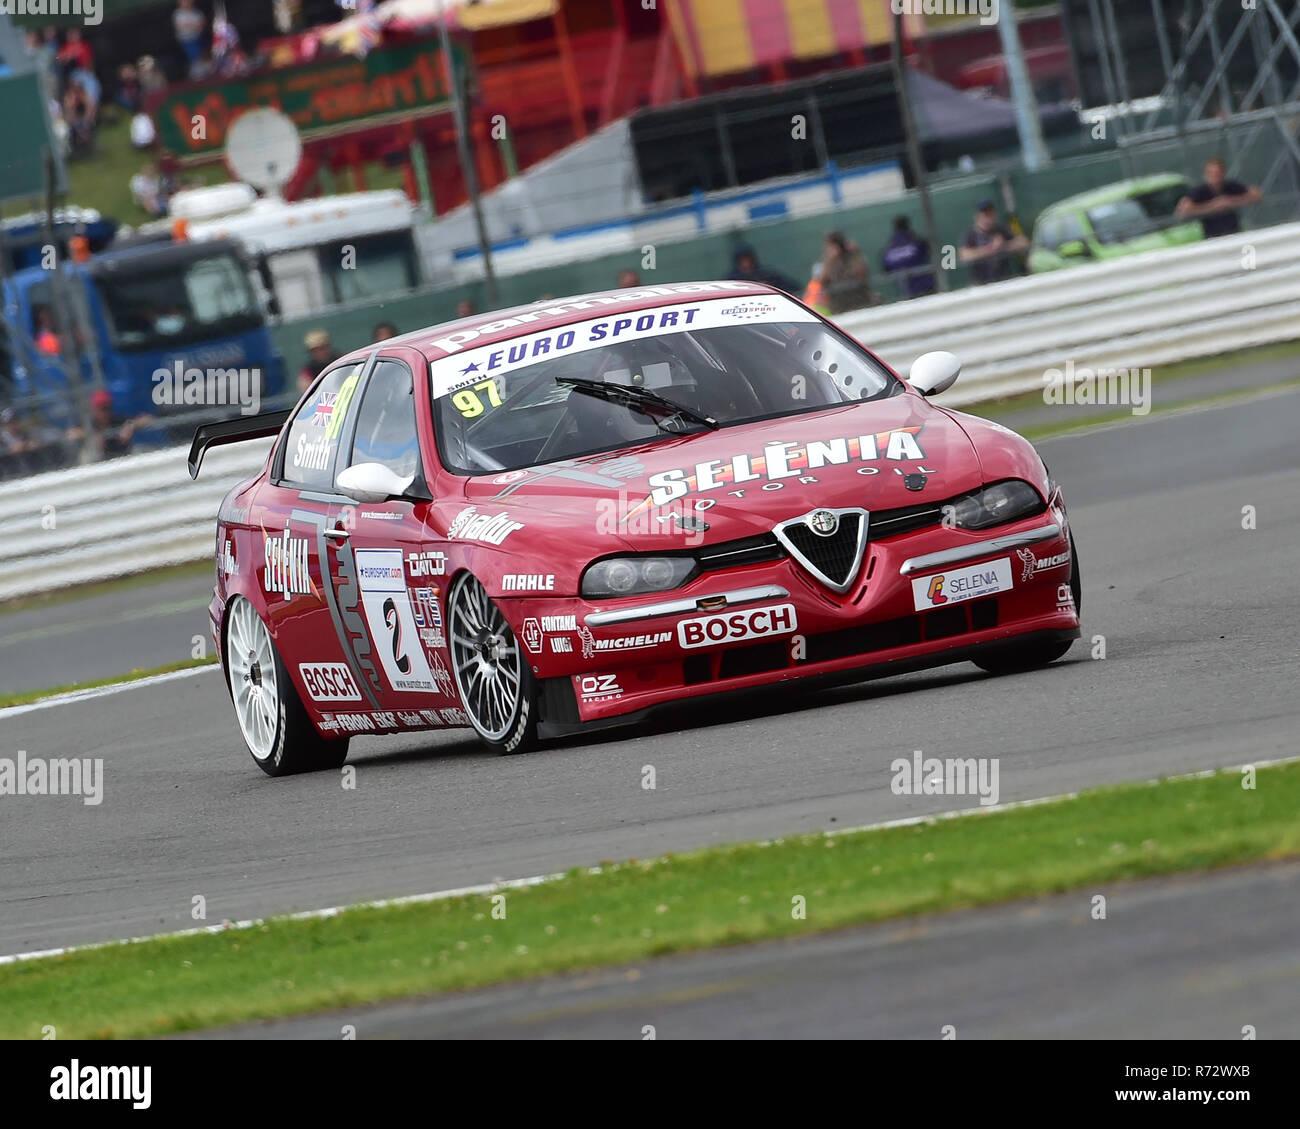 Alfa Romeo 156 Racing Car Stock Photos & Alfa Romeo 156